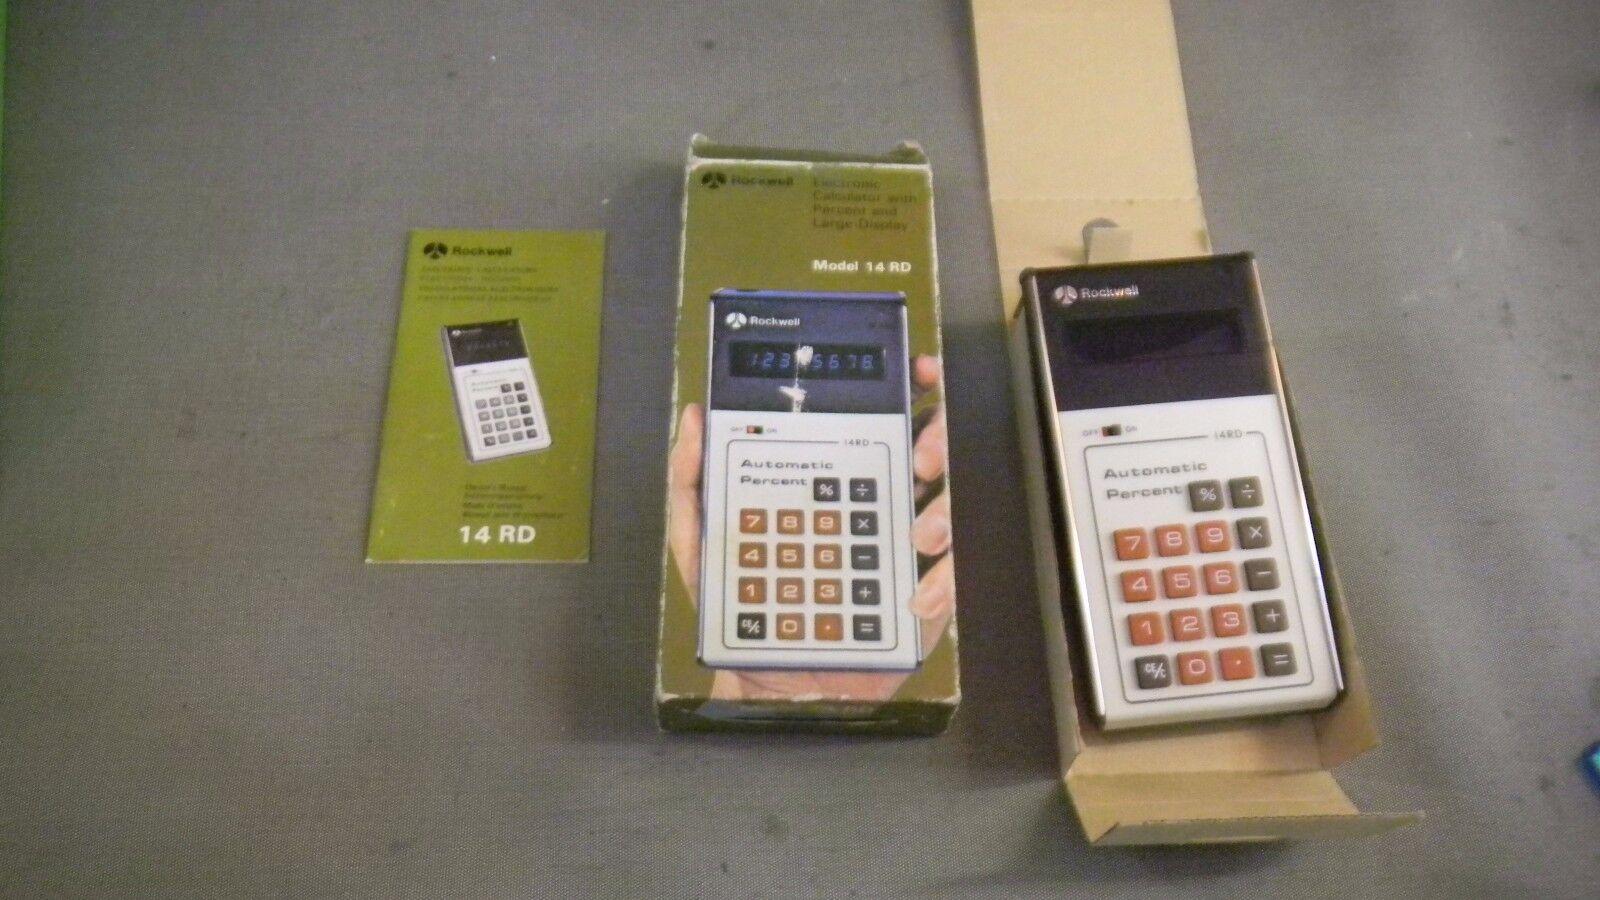 Rockwell International 14 RD Electronic Calculator ORIGINAL BOX NEVER USED